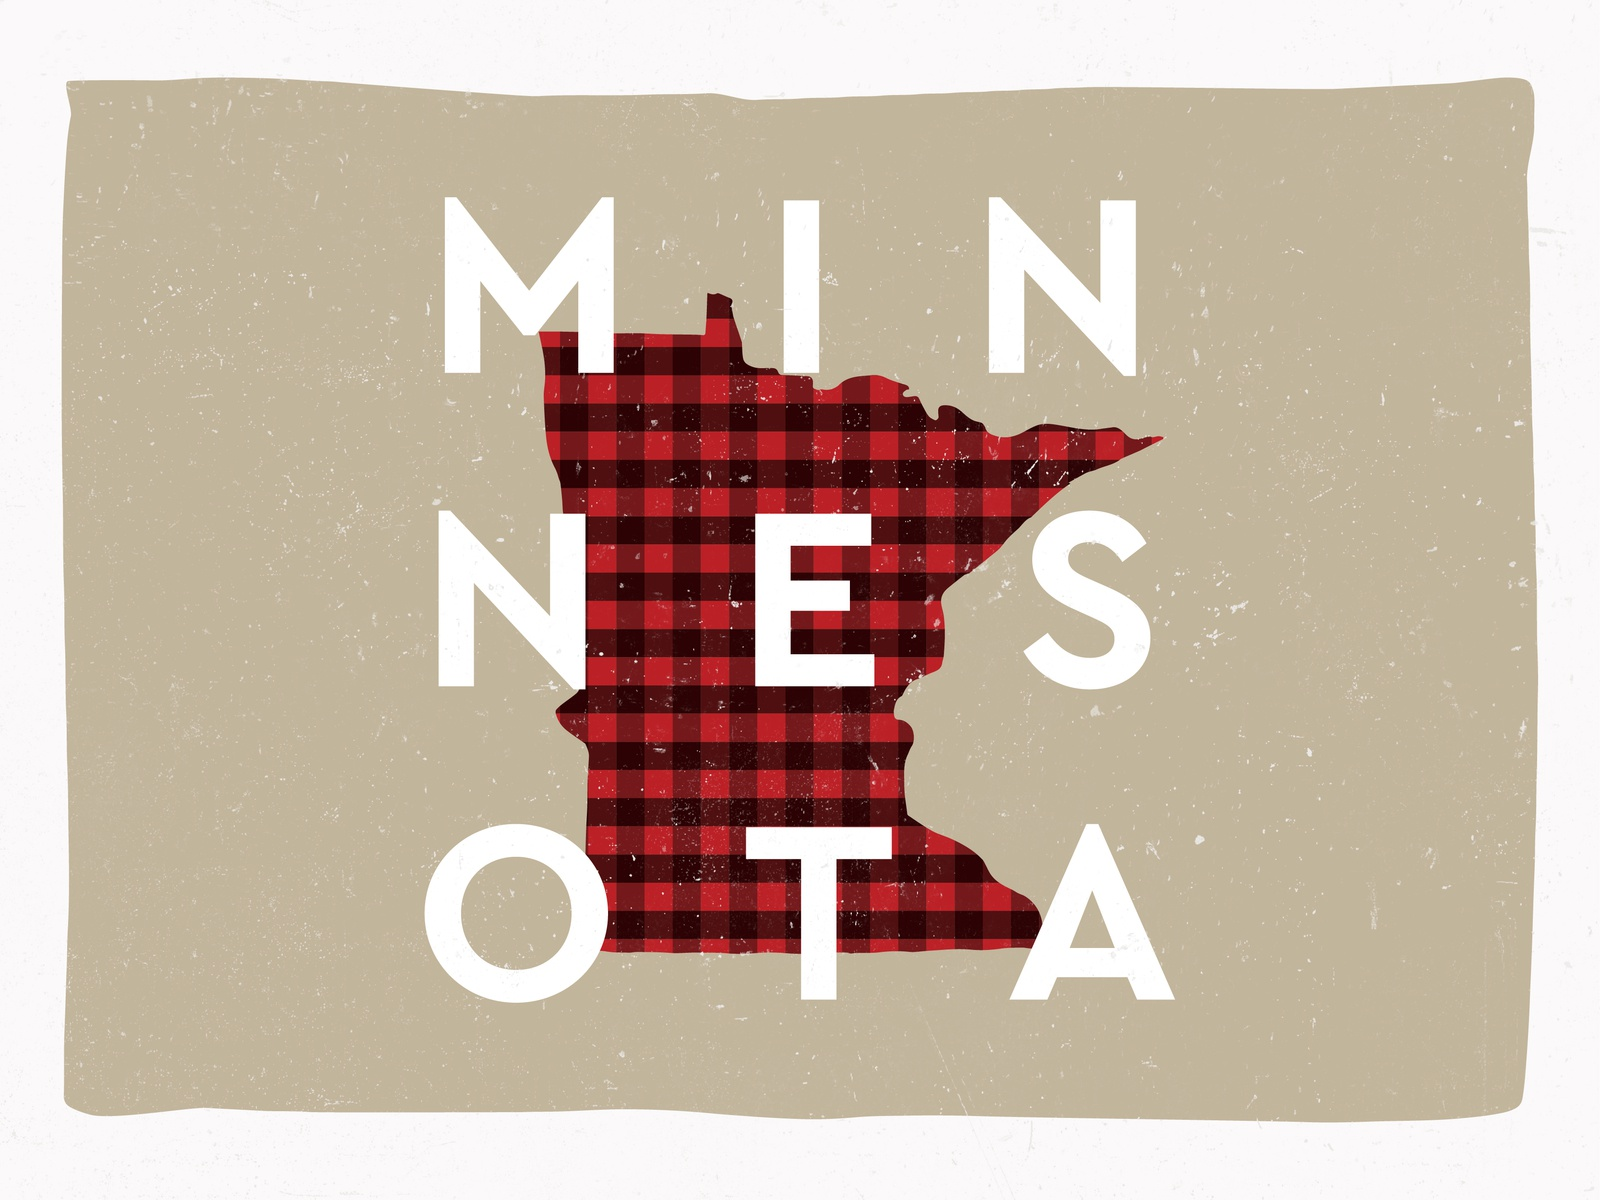 Minnesota Winter cozy winter type pattern plaid minnesota